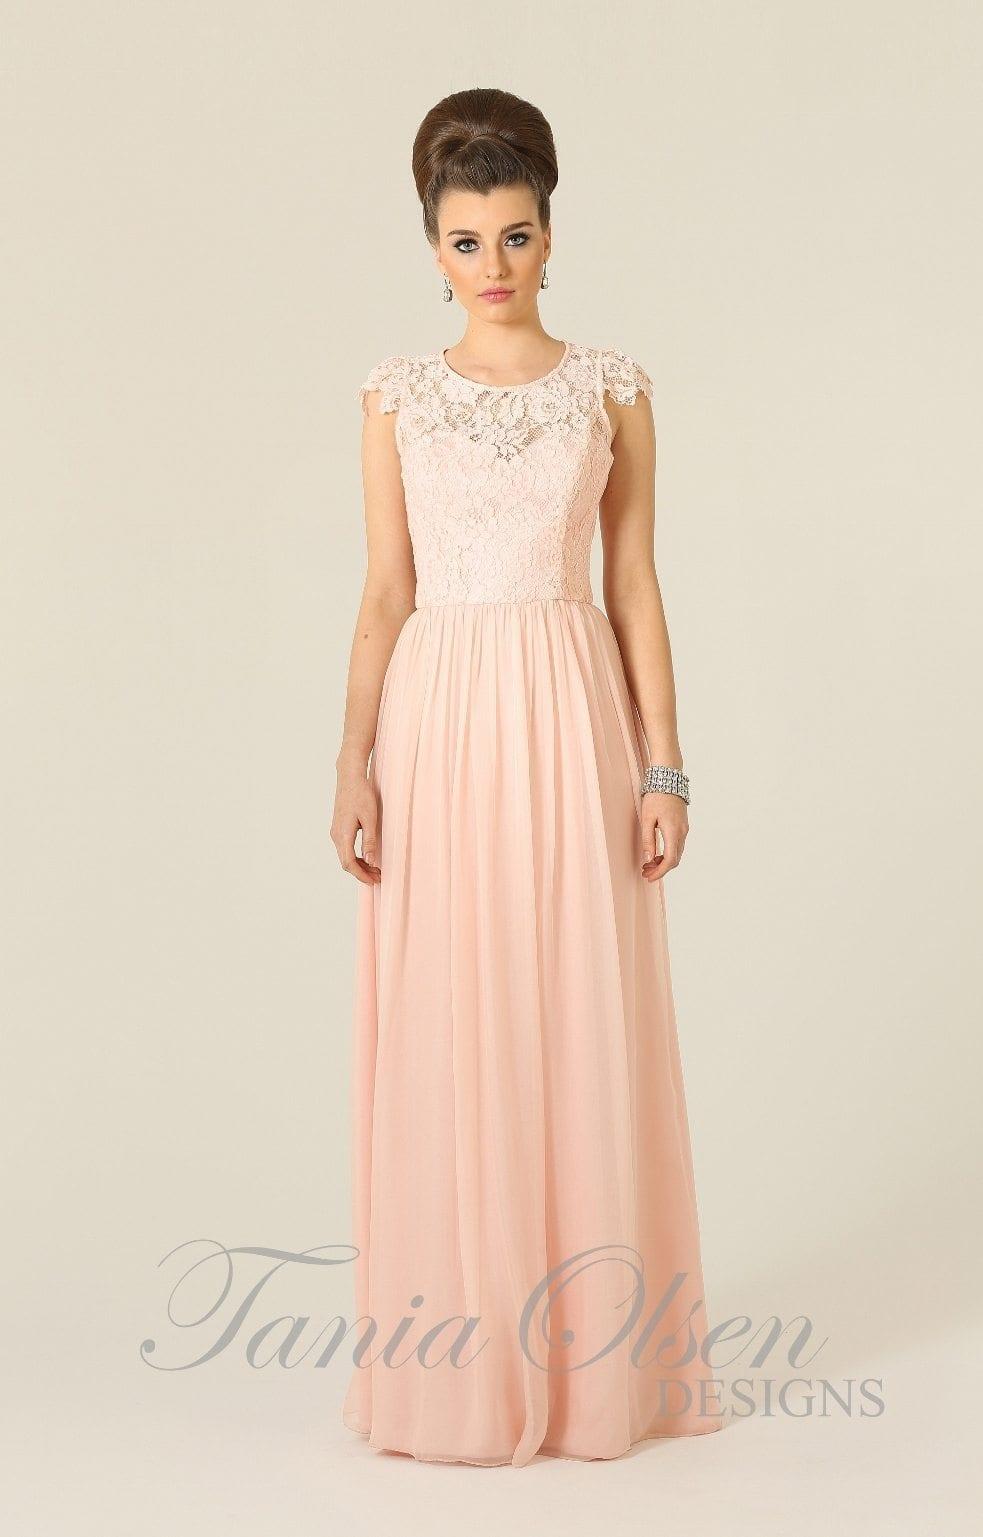 Bridesmaid dress tania olsen design latitia pink for Jessica designs international wedding dresses